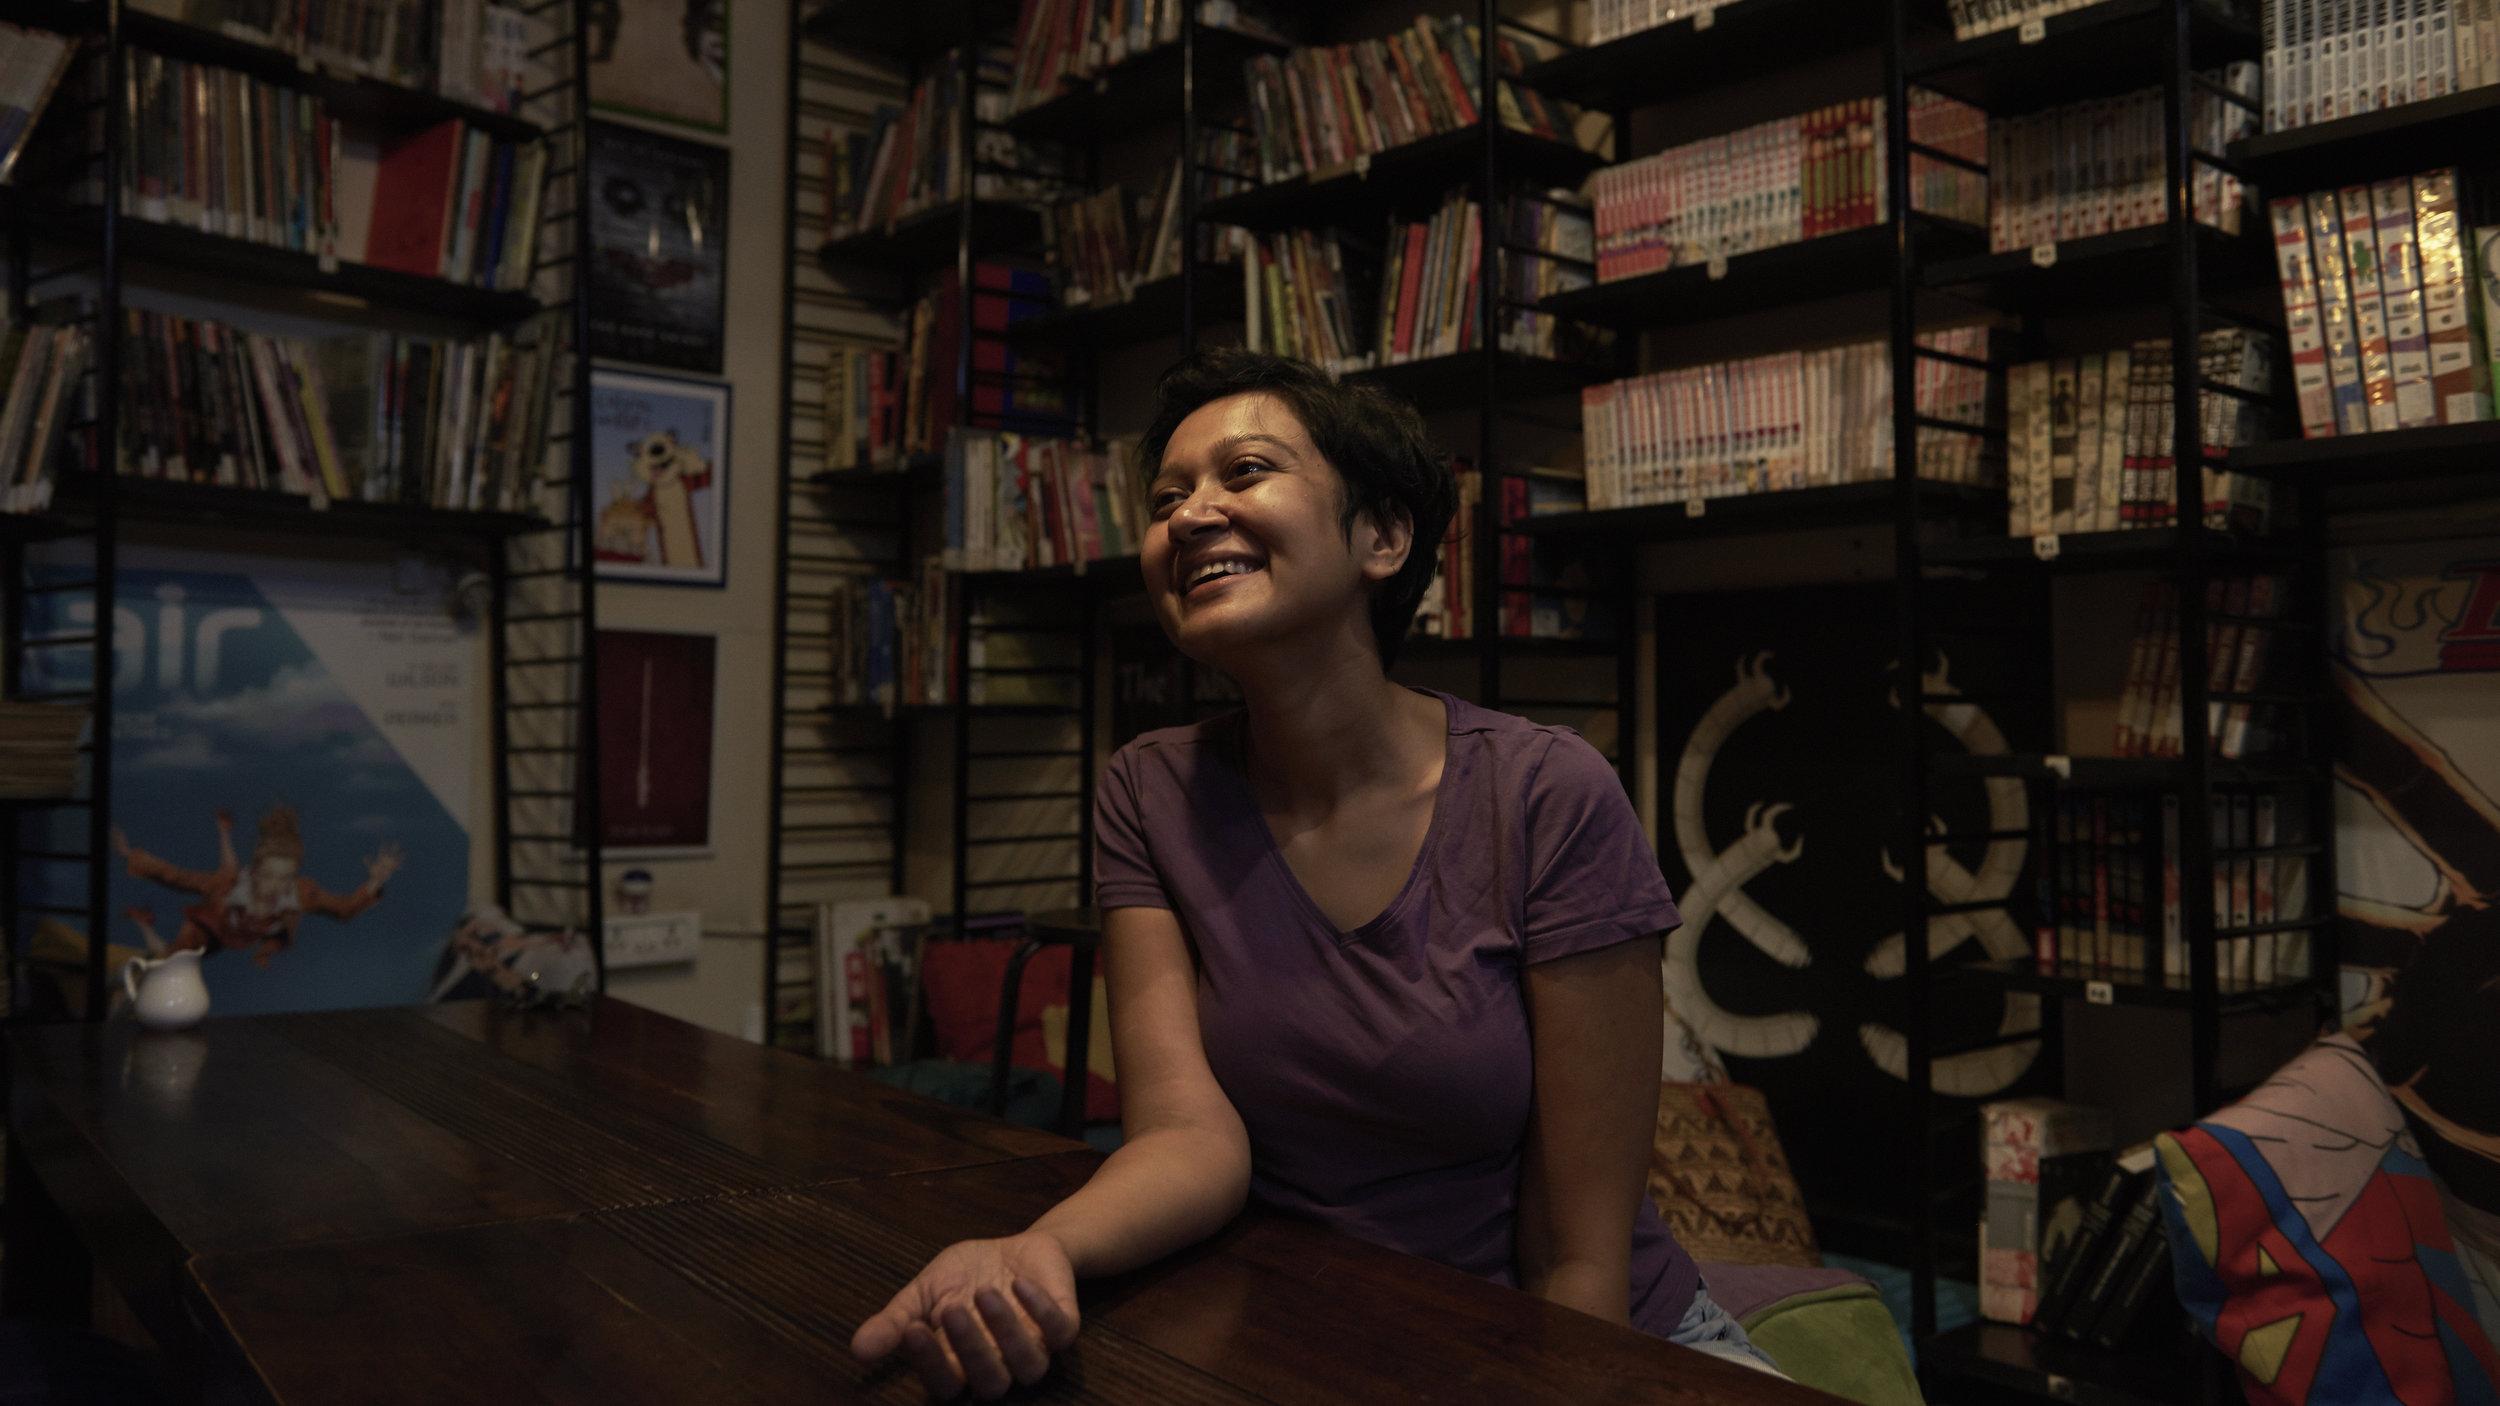 Bidisha Basu along with her husband Utsa Shome started Leaping Windows, a library and café for comic books, graphic novels and manga.